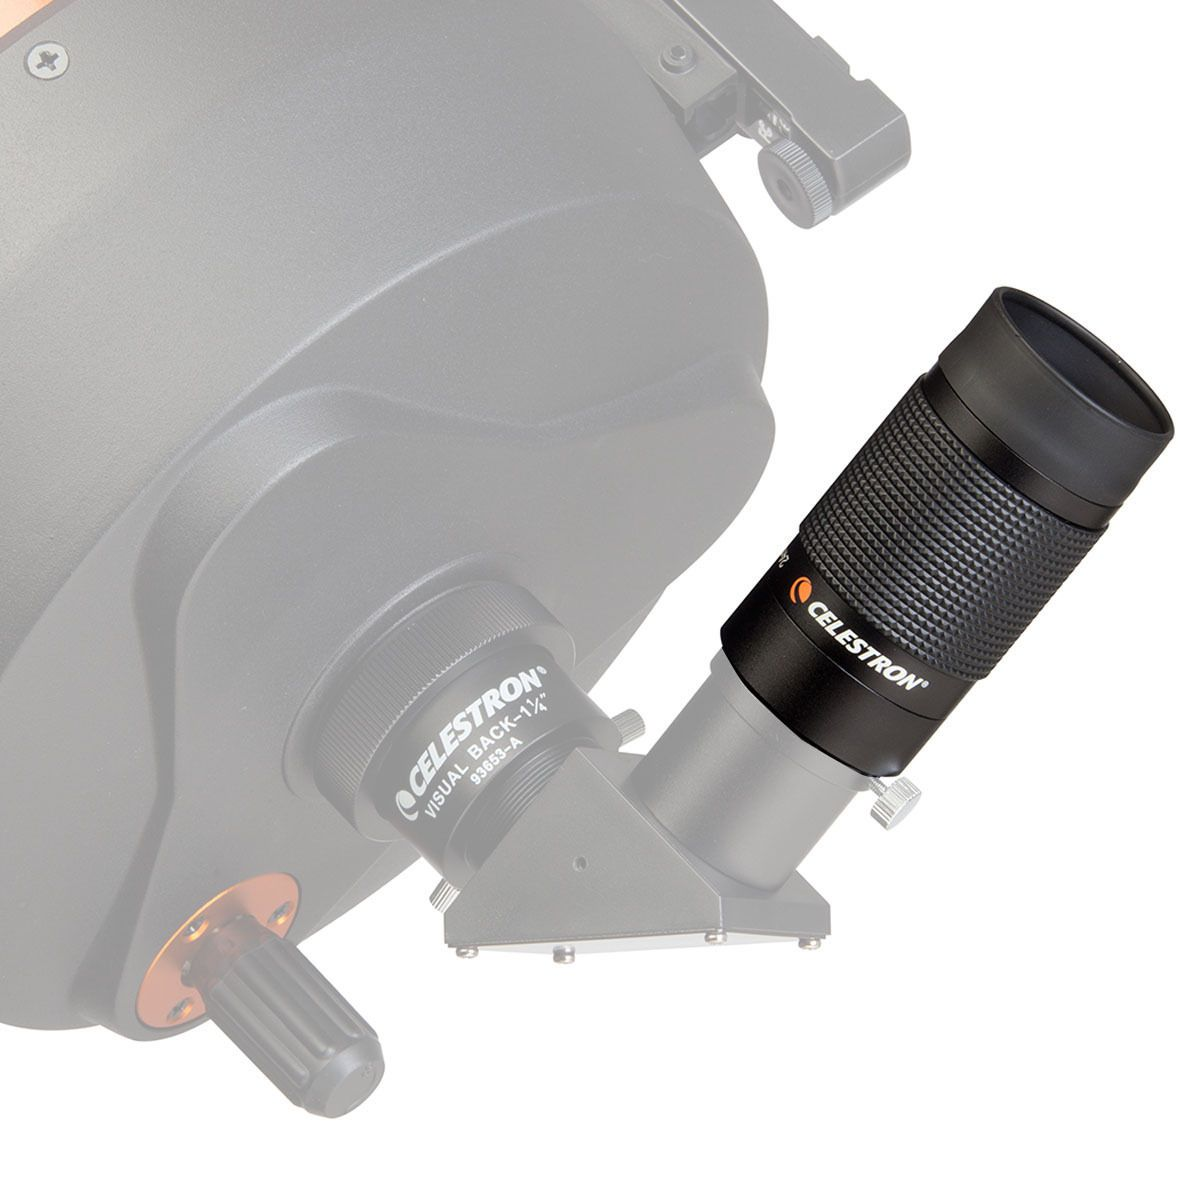 Ocular Celestron 1,25 Zoom 8-24 Mm - Para Telescopio